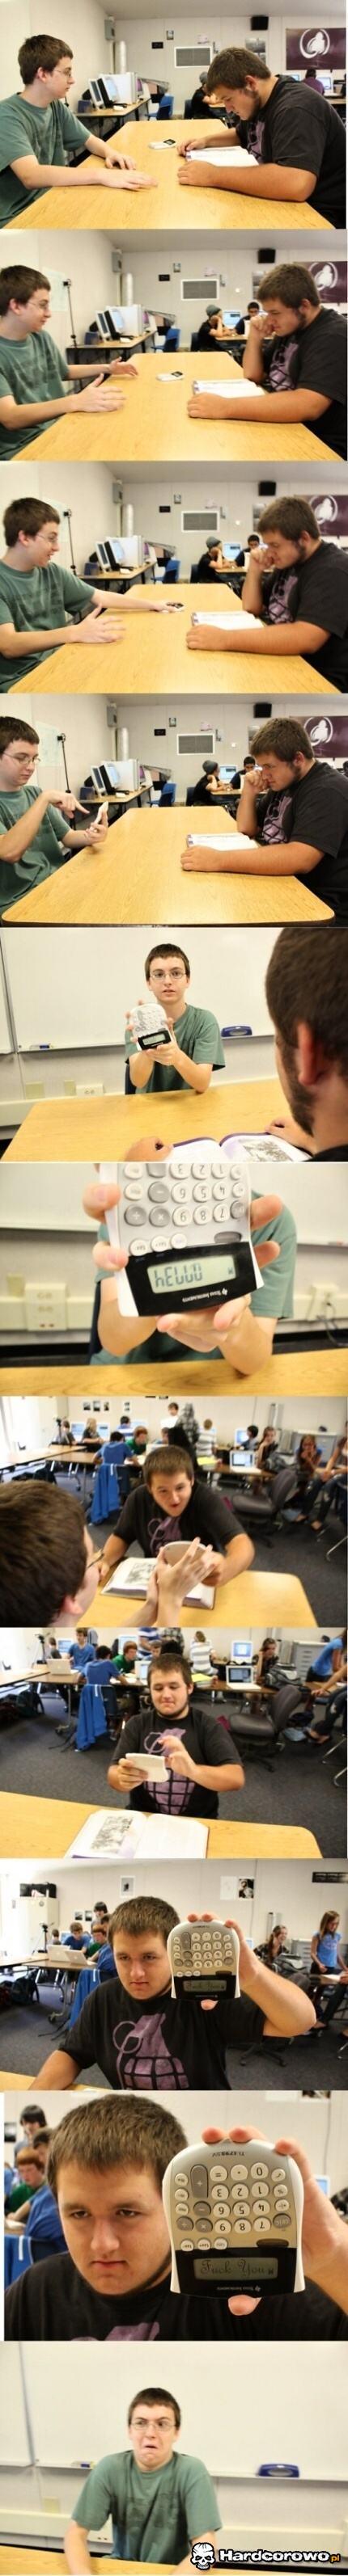 Na kalkulatorze - 1